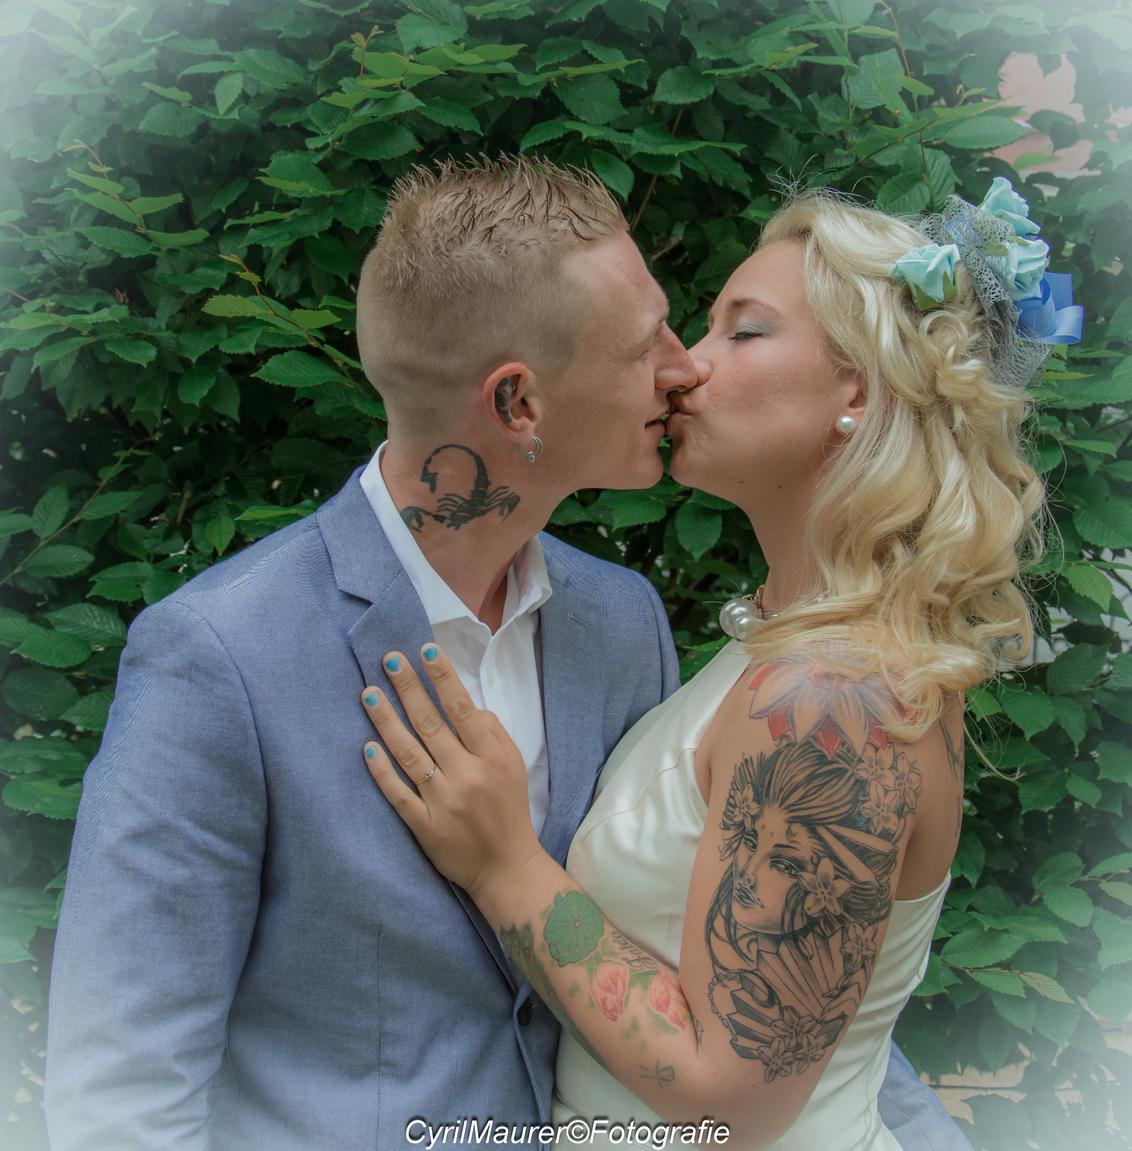 Kissing Married Couple - - - foto door sipmaurer op 13-06-2016 - deze foto bevat: portret, liefde, daglicht, beauty, emotie, bruid, bruiloft, blond, closeup, fotoshoot, bruidegom